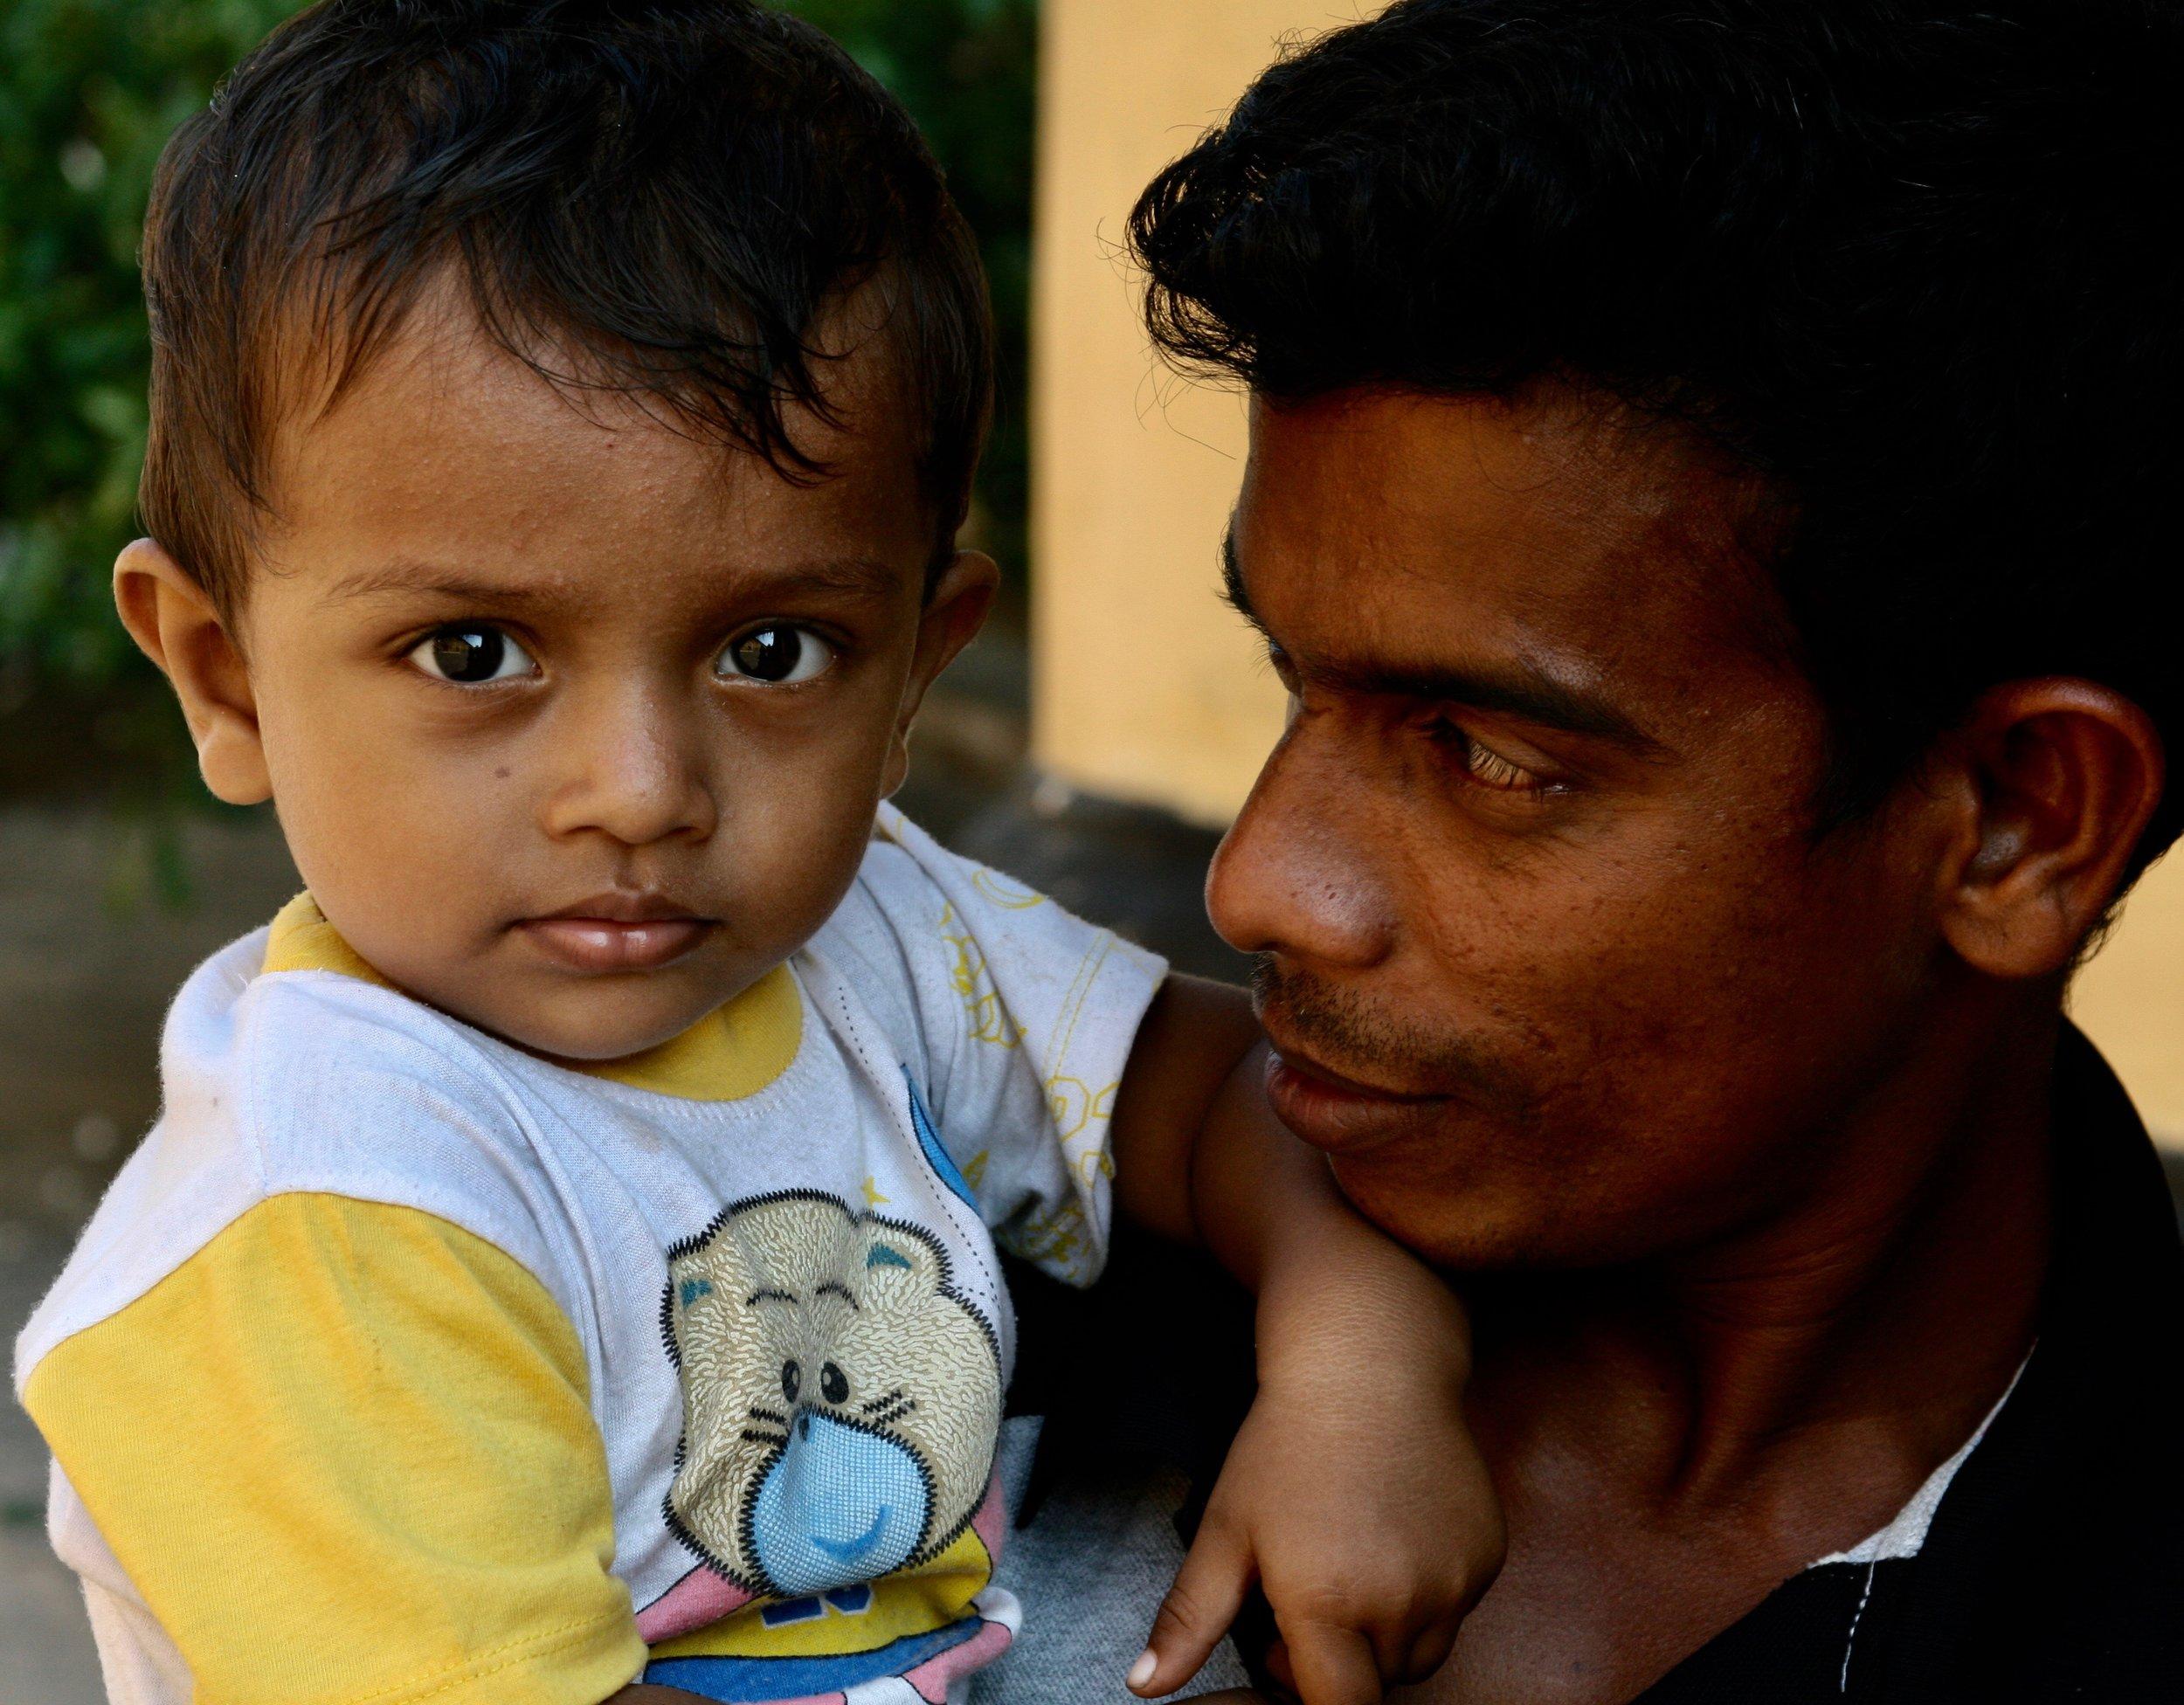 People-Sri Lankan Baby and Father.jpg